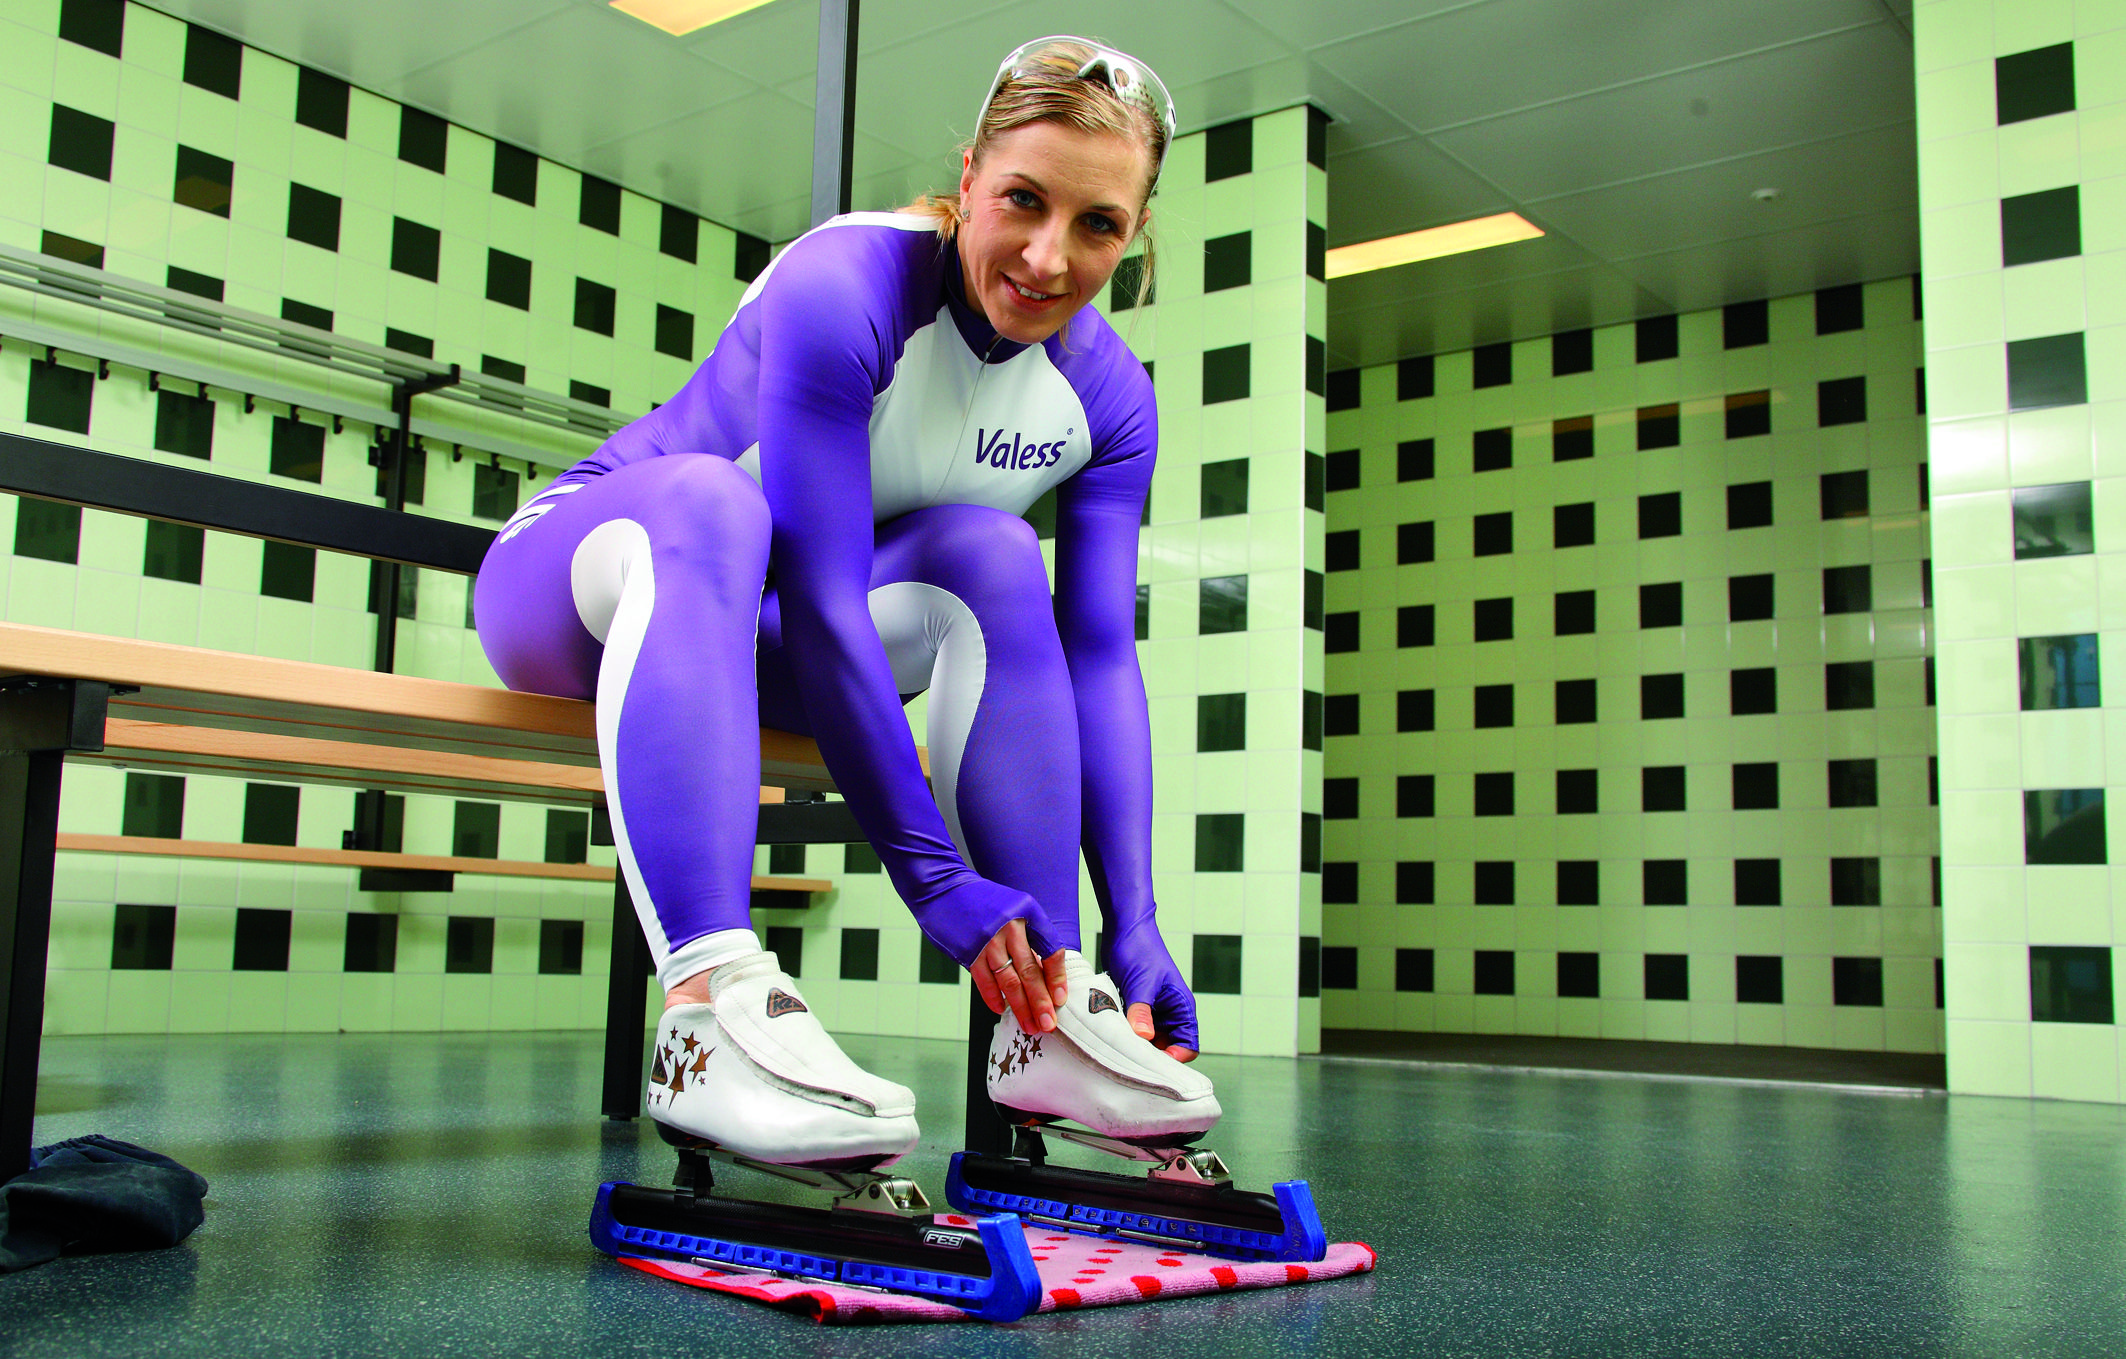 At Age 46, KC Boutiette Becomes Oldest Speedskater Ever To